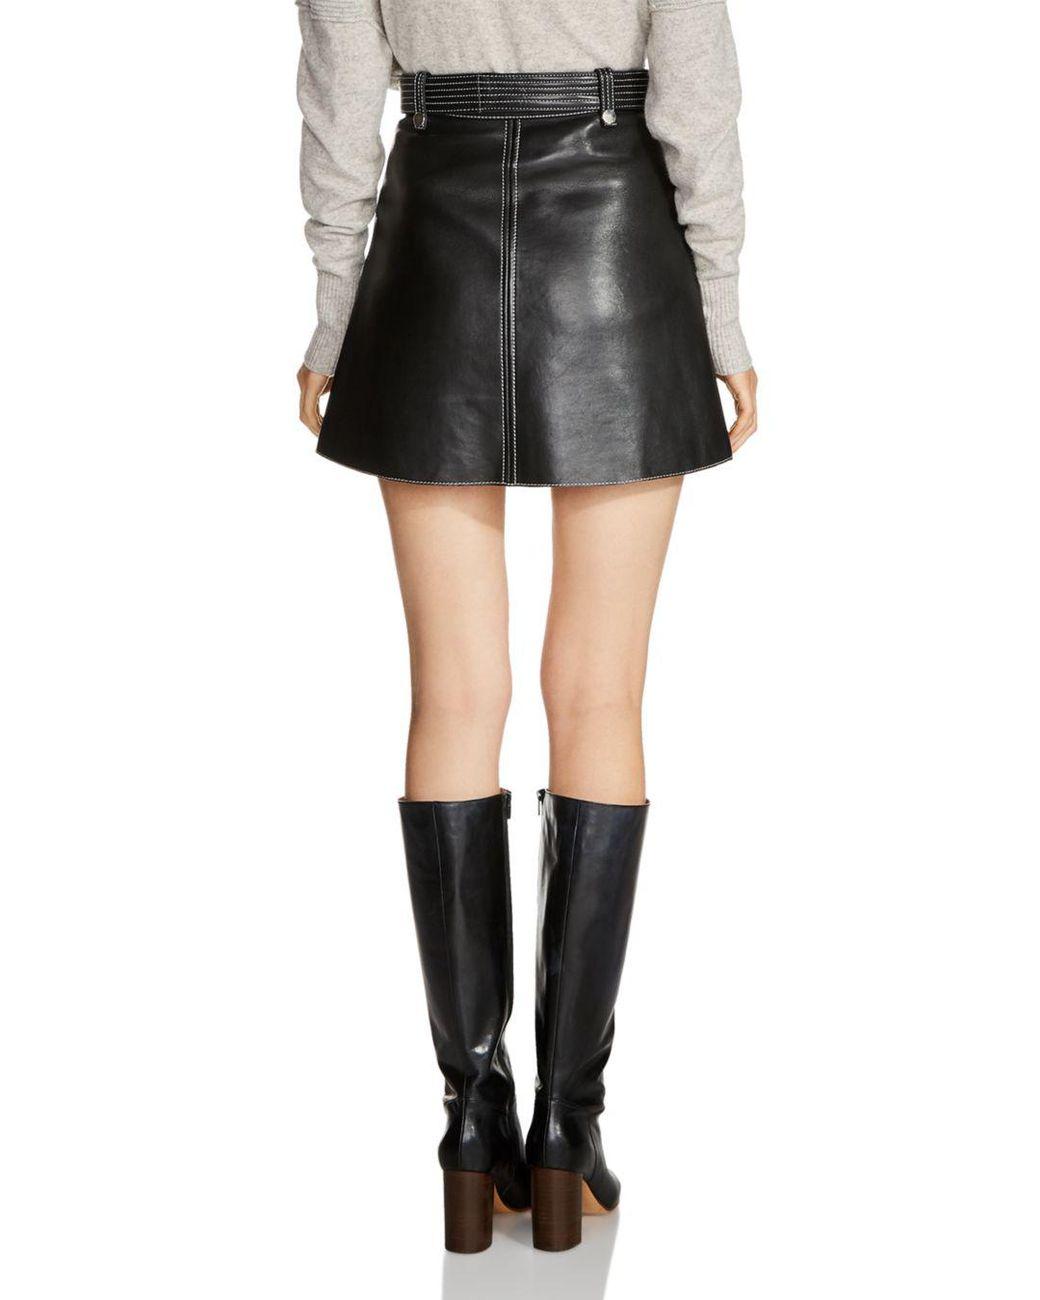 c7e2db6ef Maje Jouki Leather Mini Skirt in Black - Save 53% - Lyst